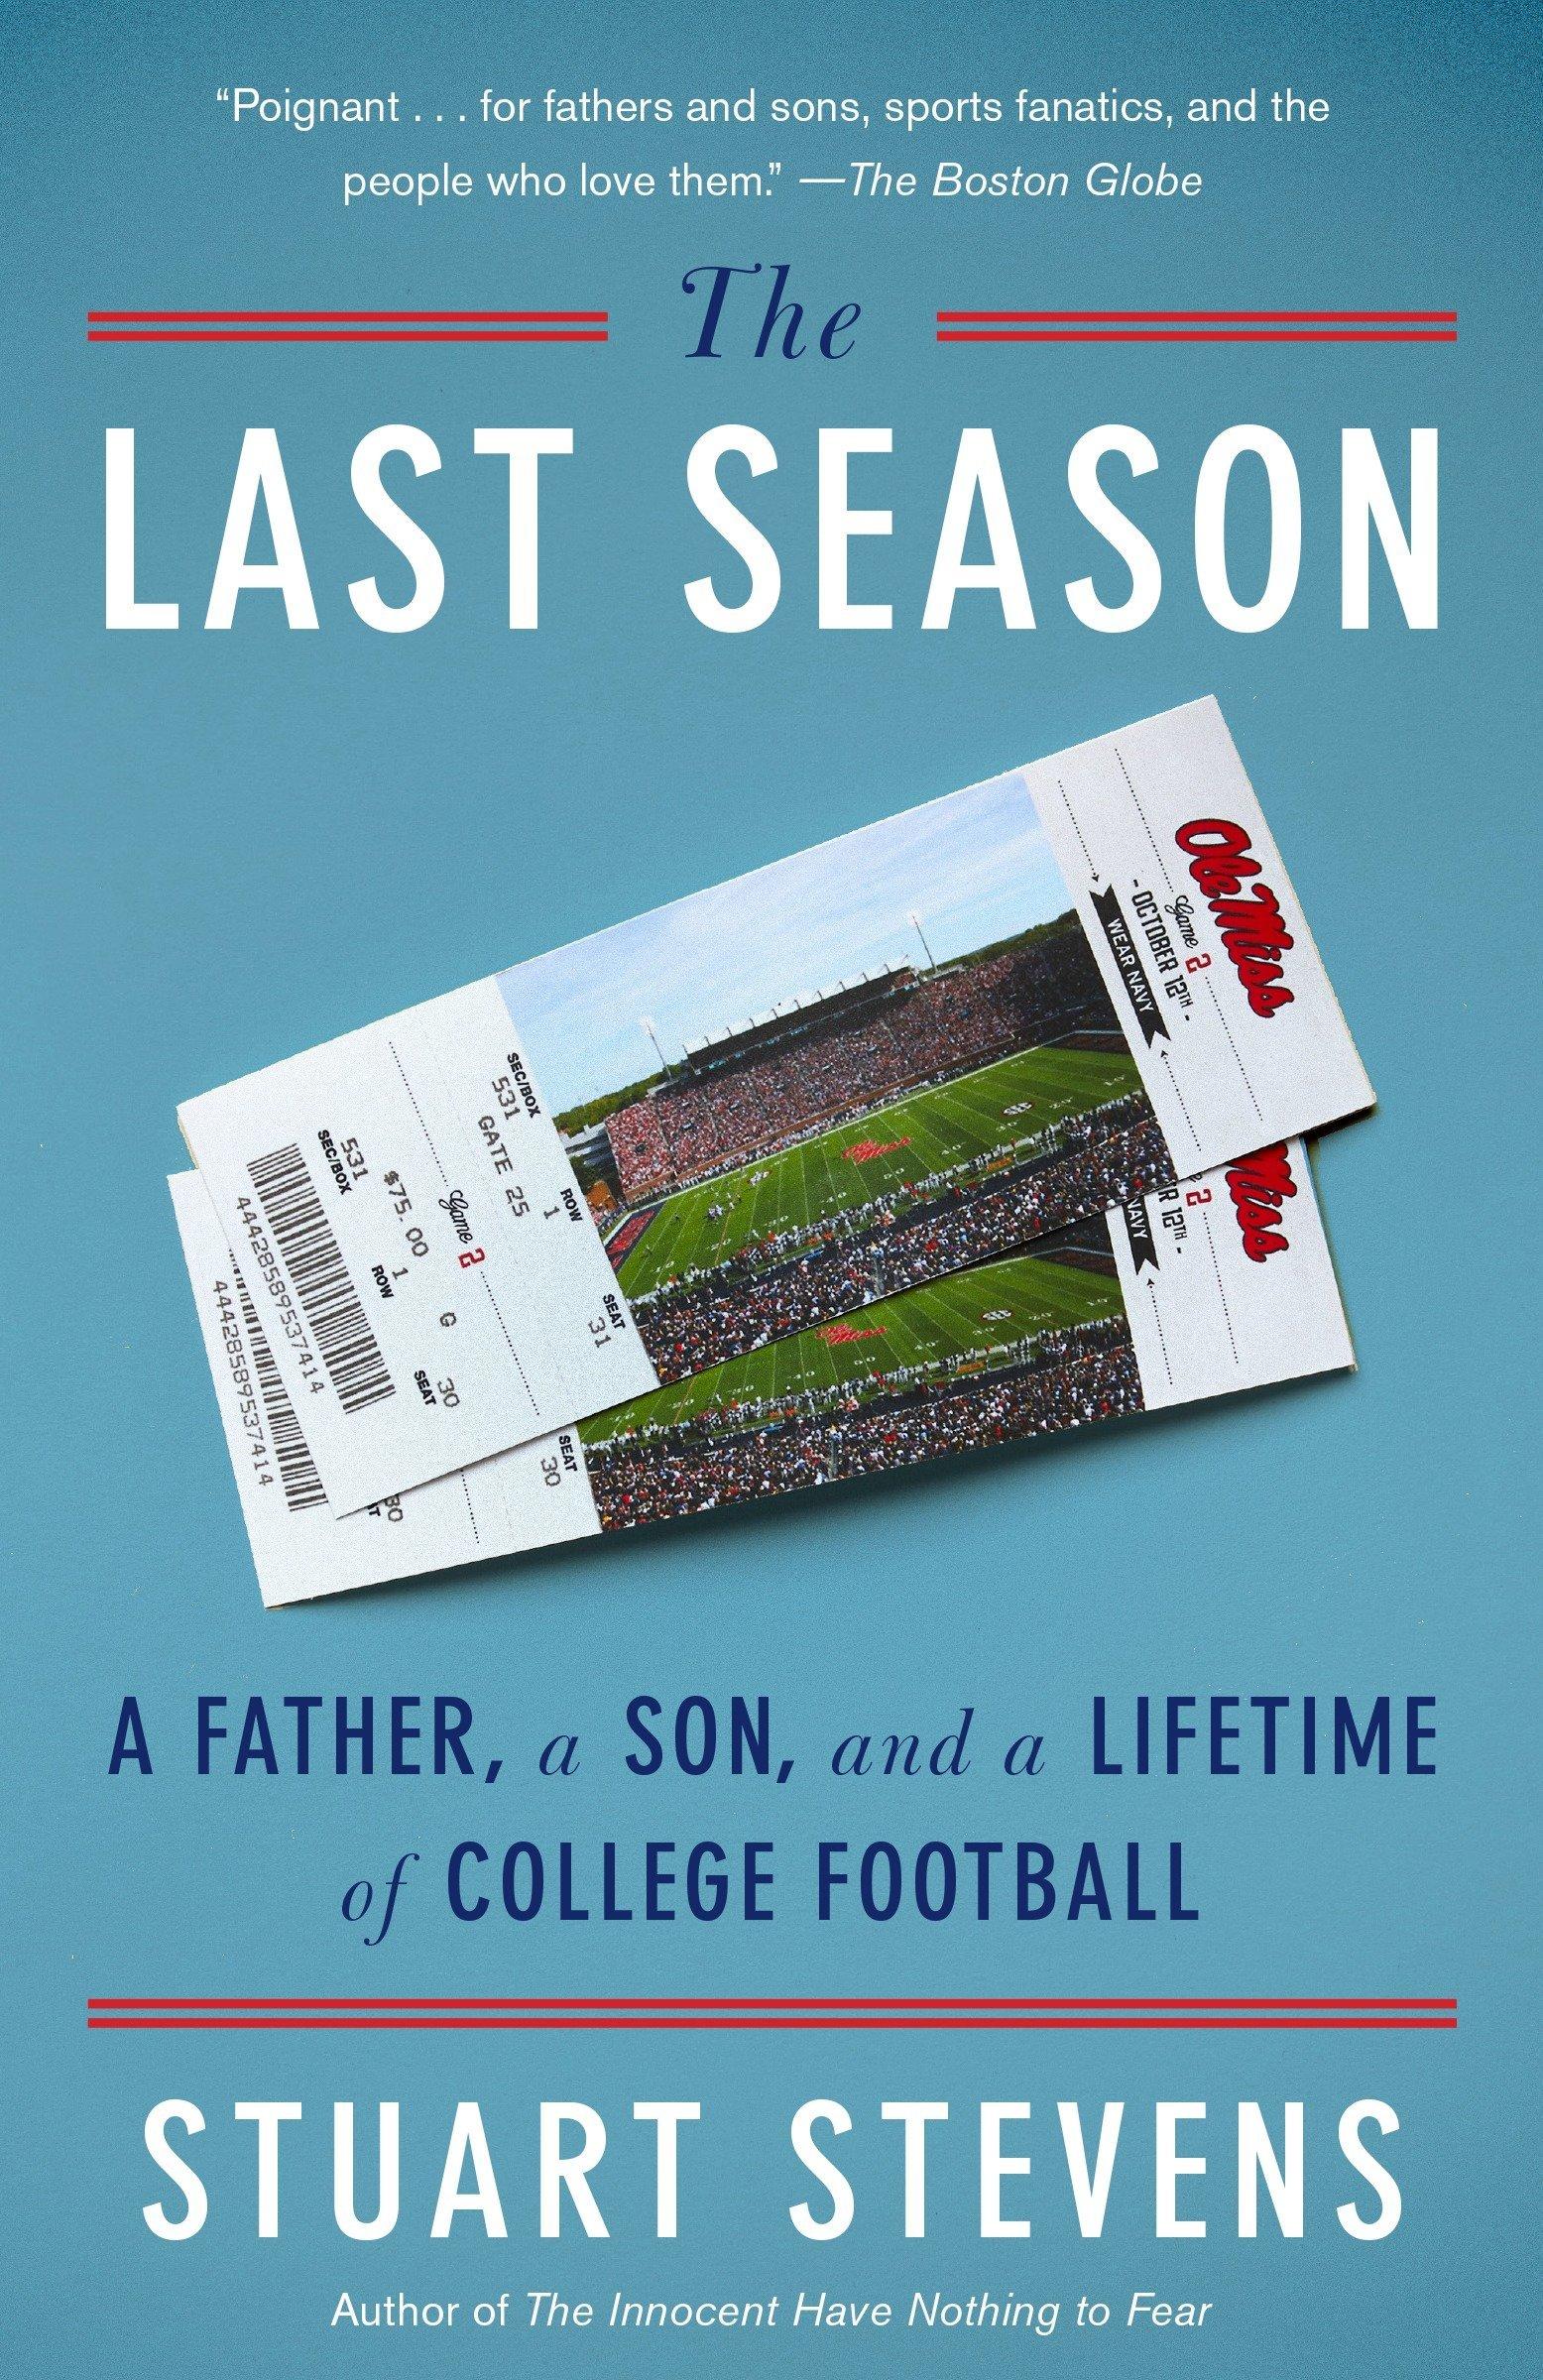 Amazon.com: The Last Season: A Father, a Son, and a Lifetime of College  Football (9780804172509): Stuart Stevens: Books